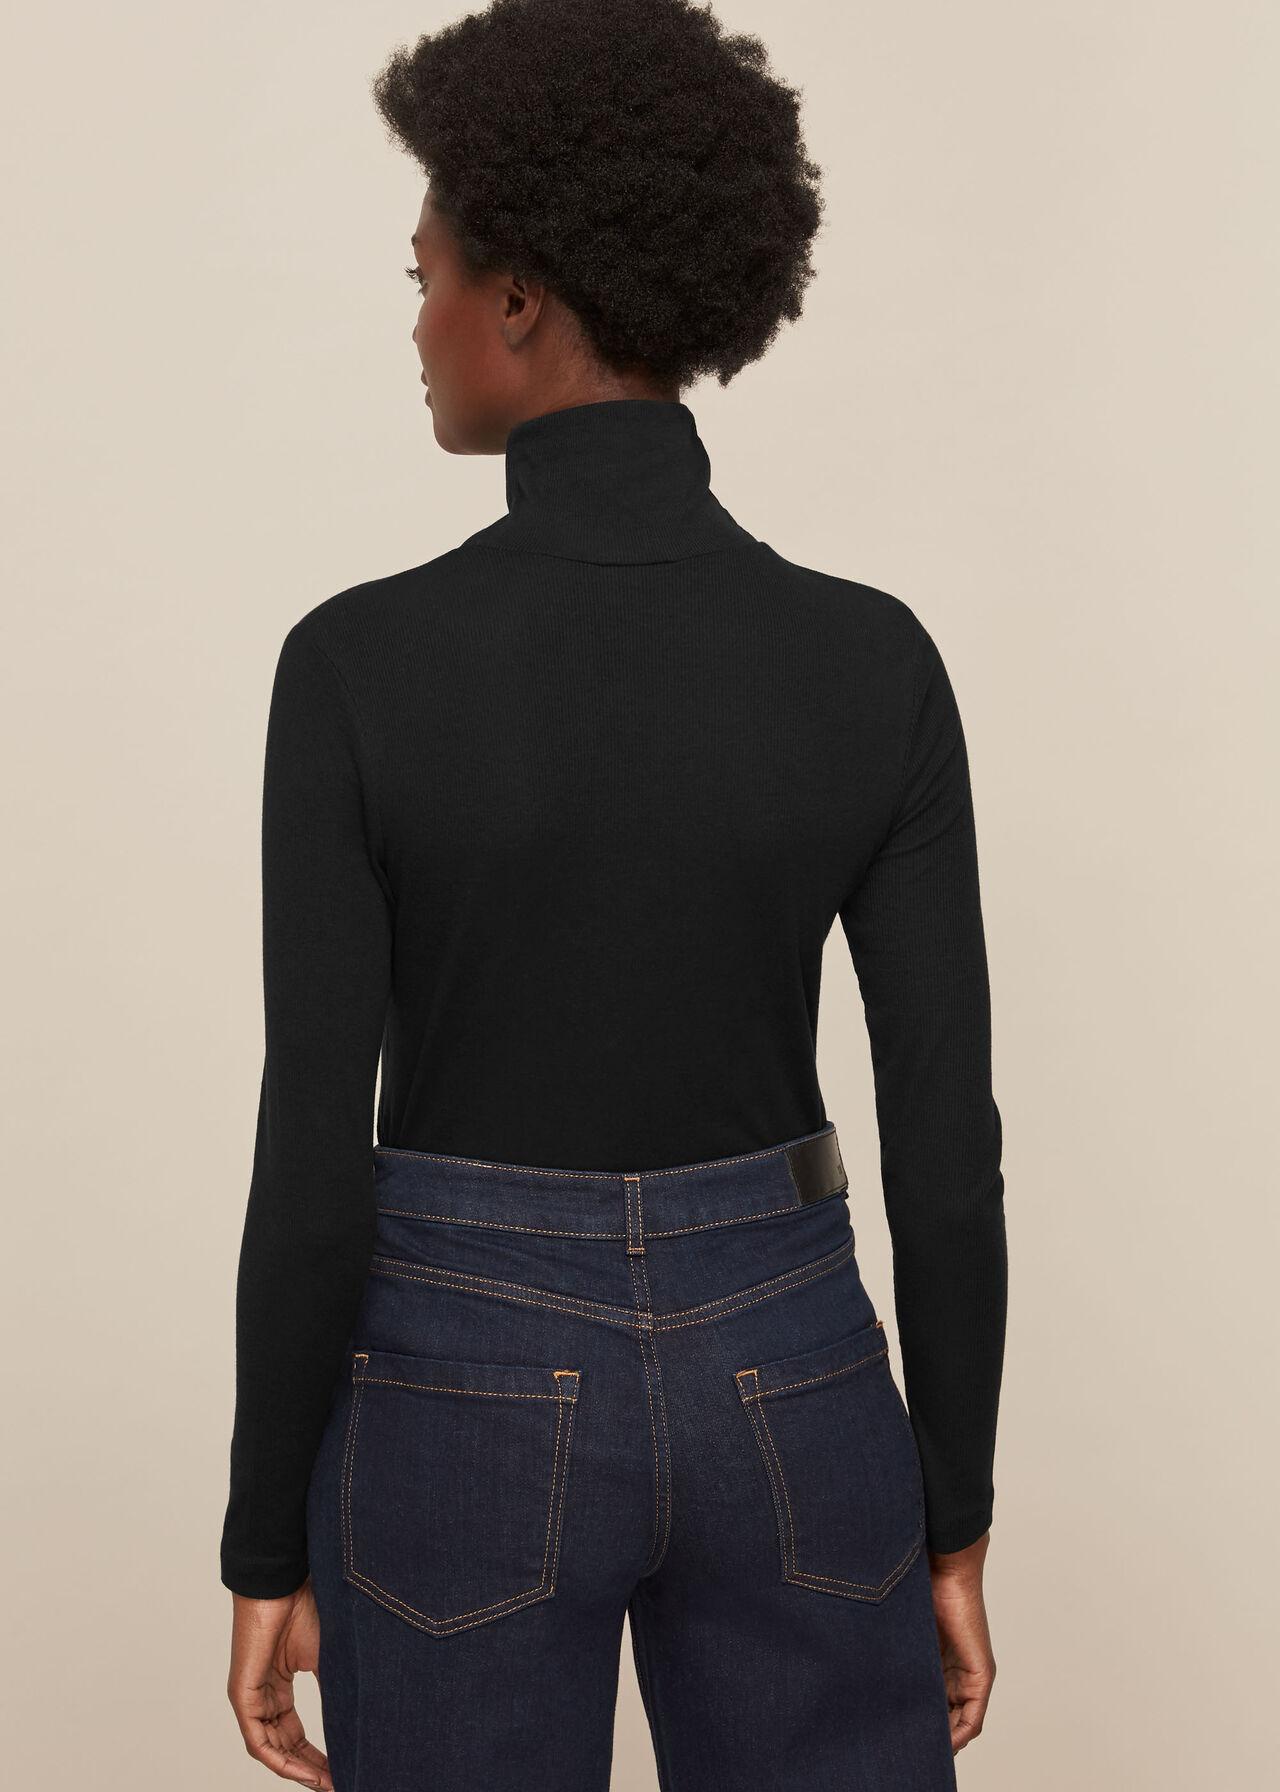 Essential Polo Neck Black